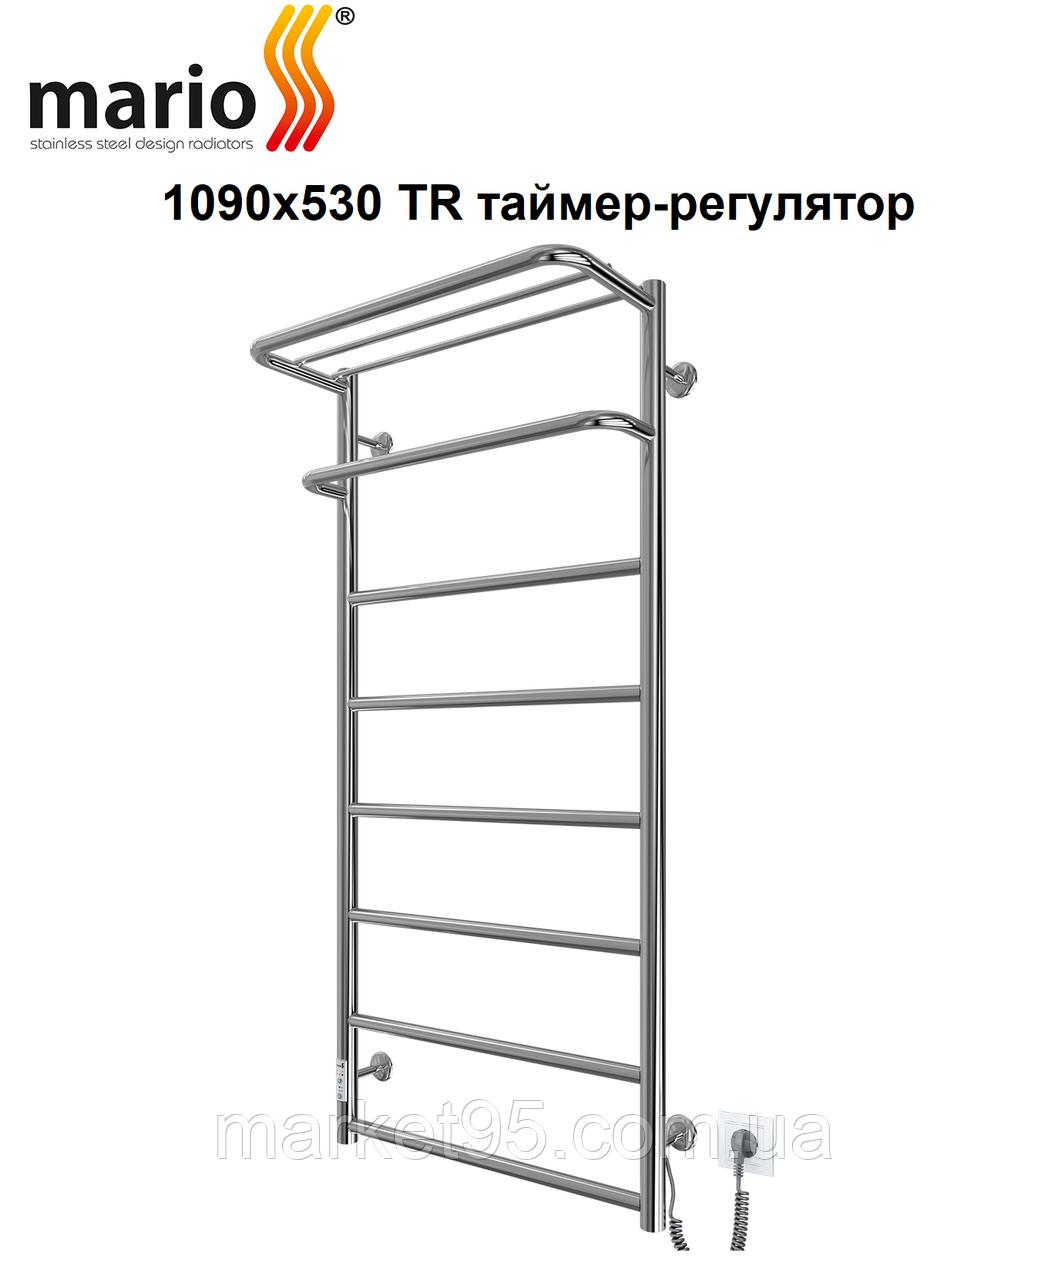 Электрический полотенцесушитель Mario Hotel -I 1090х530 TR таймер-регулятор